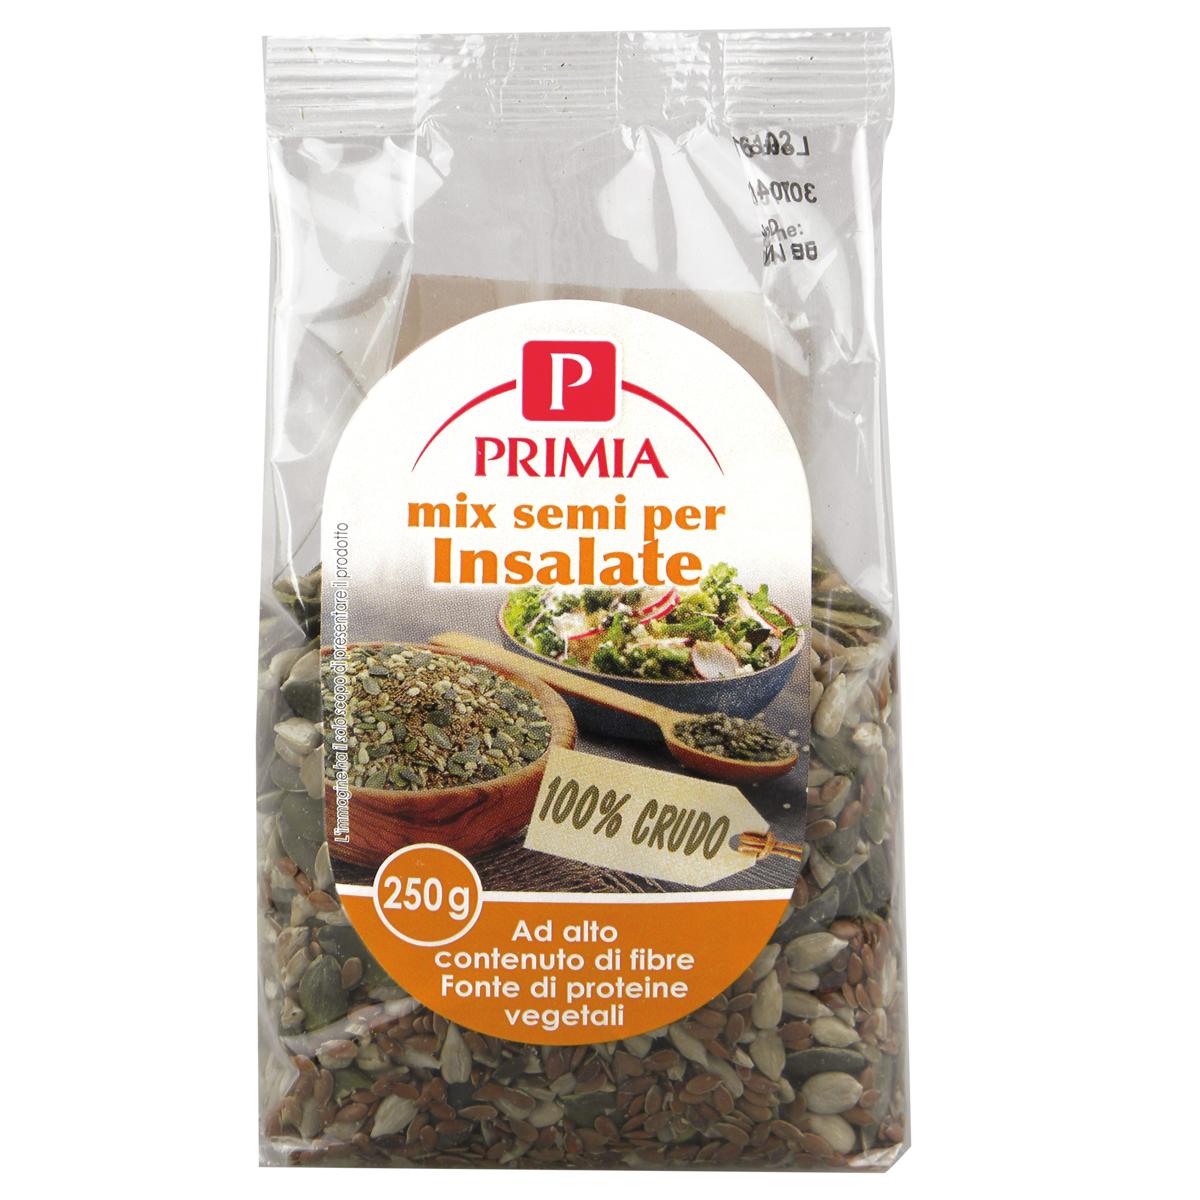 Primia Mix di semi per insalate